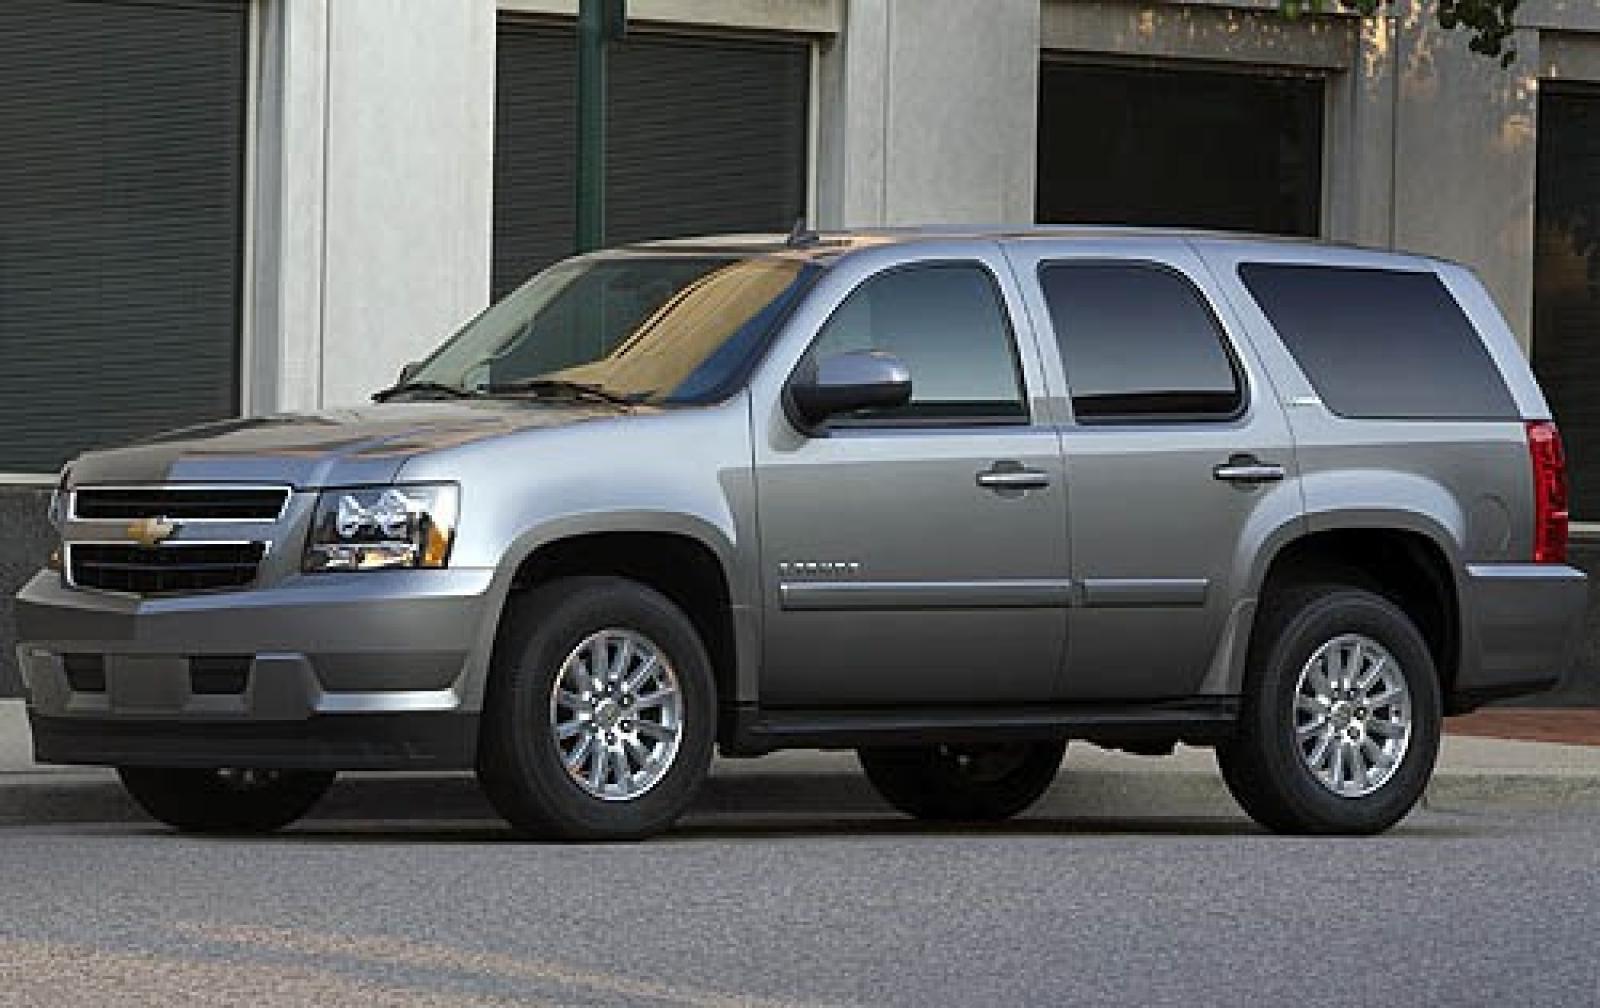 2008 chevrolet tahoe hybrid 1 800 1024 1280 1600 origin